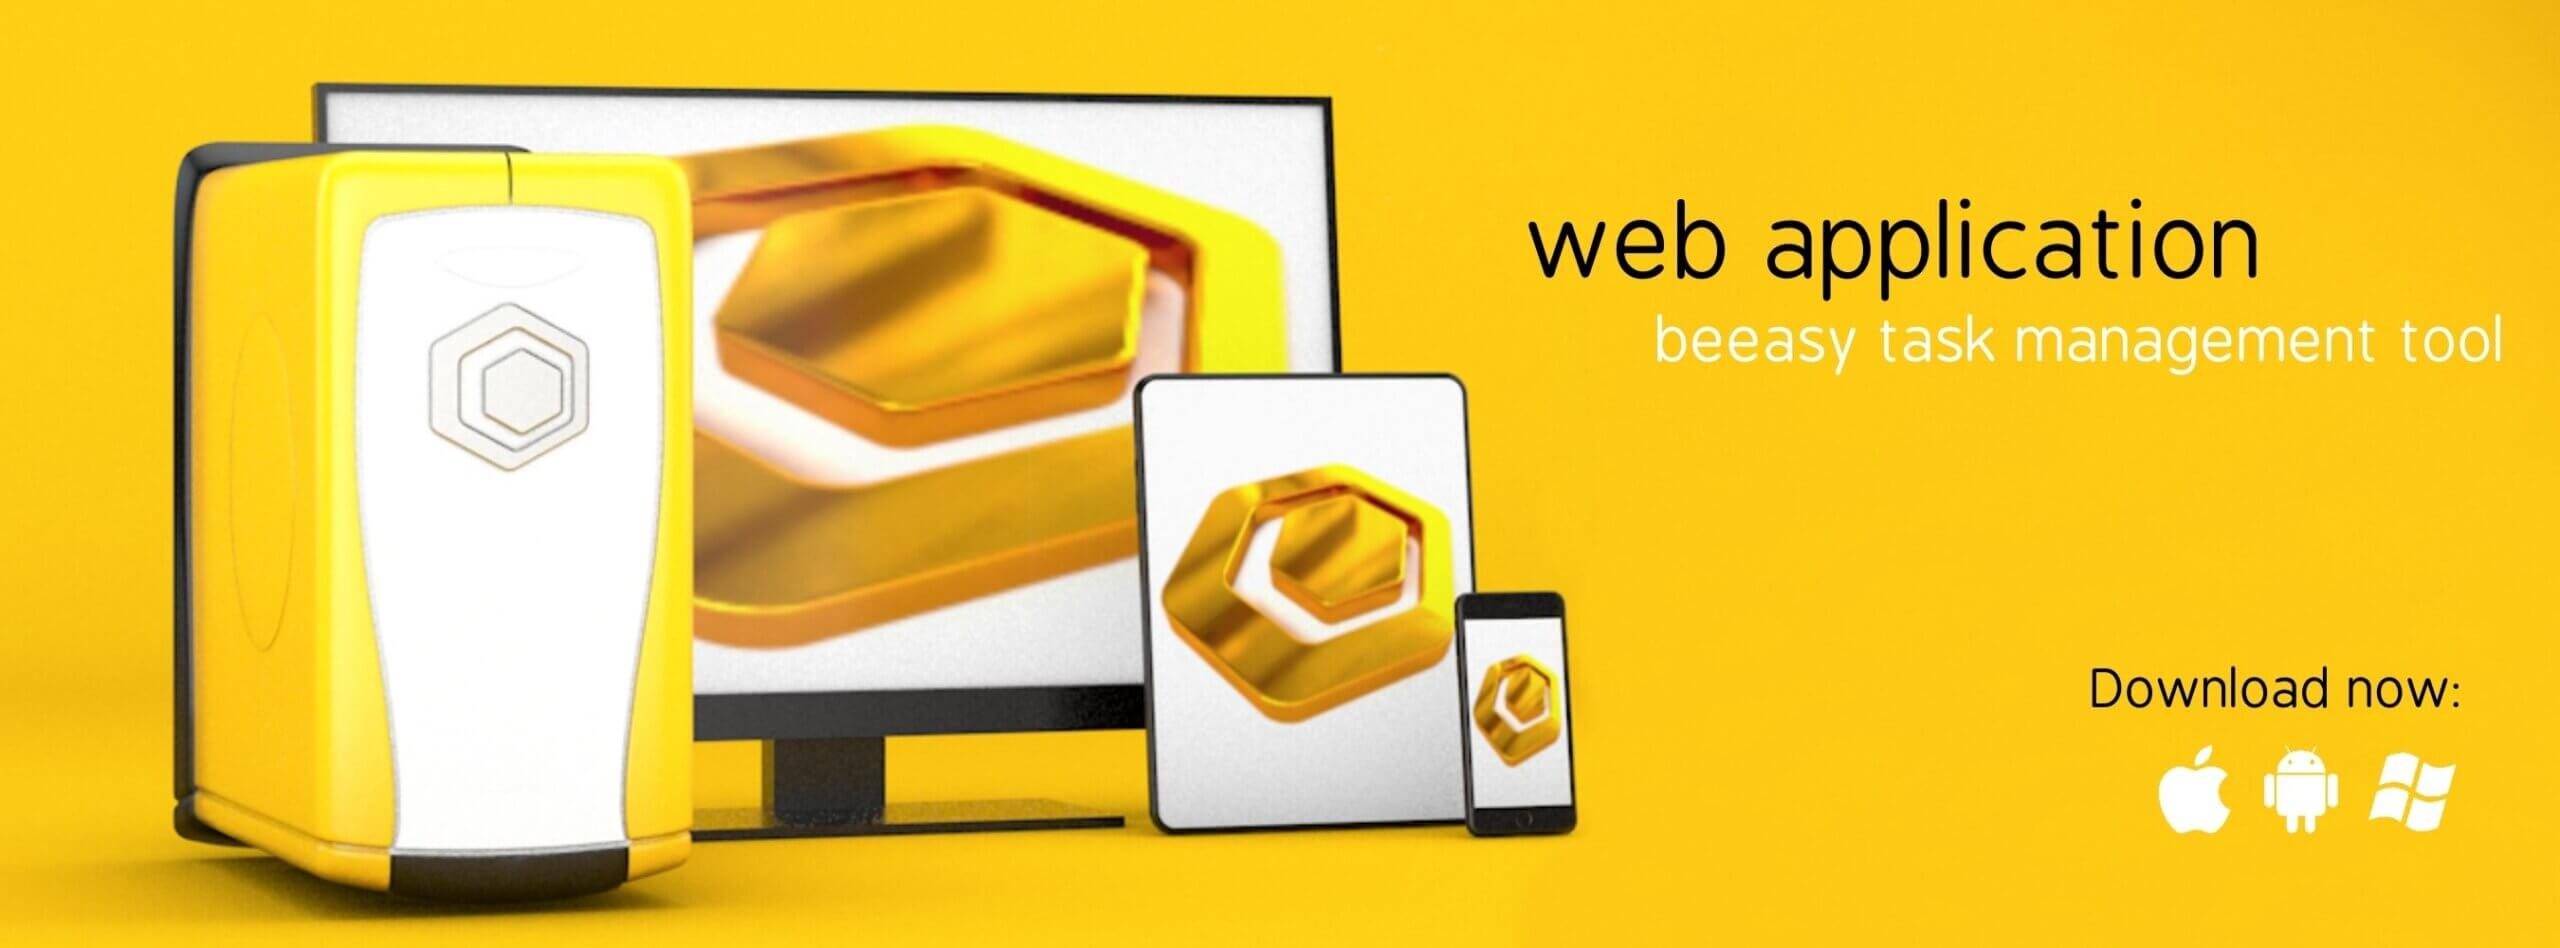 webapp-beeasy